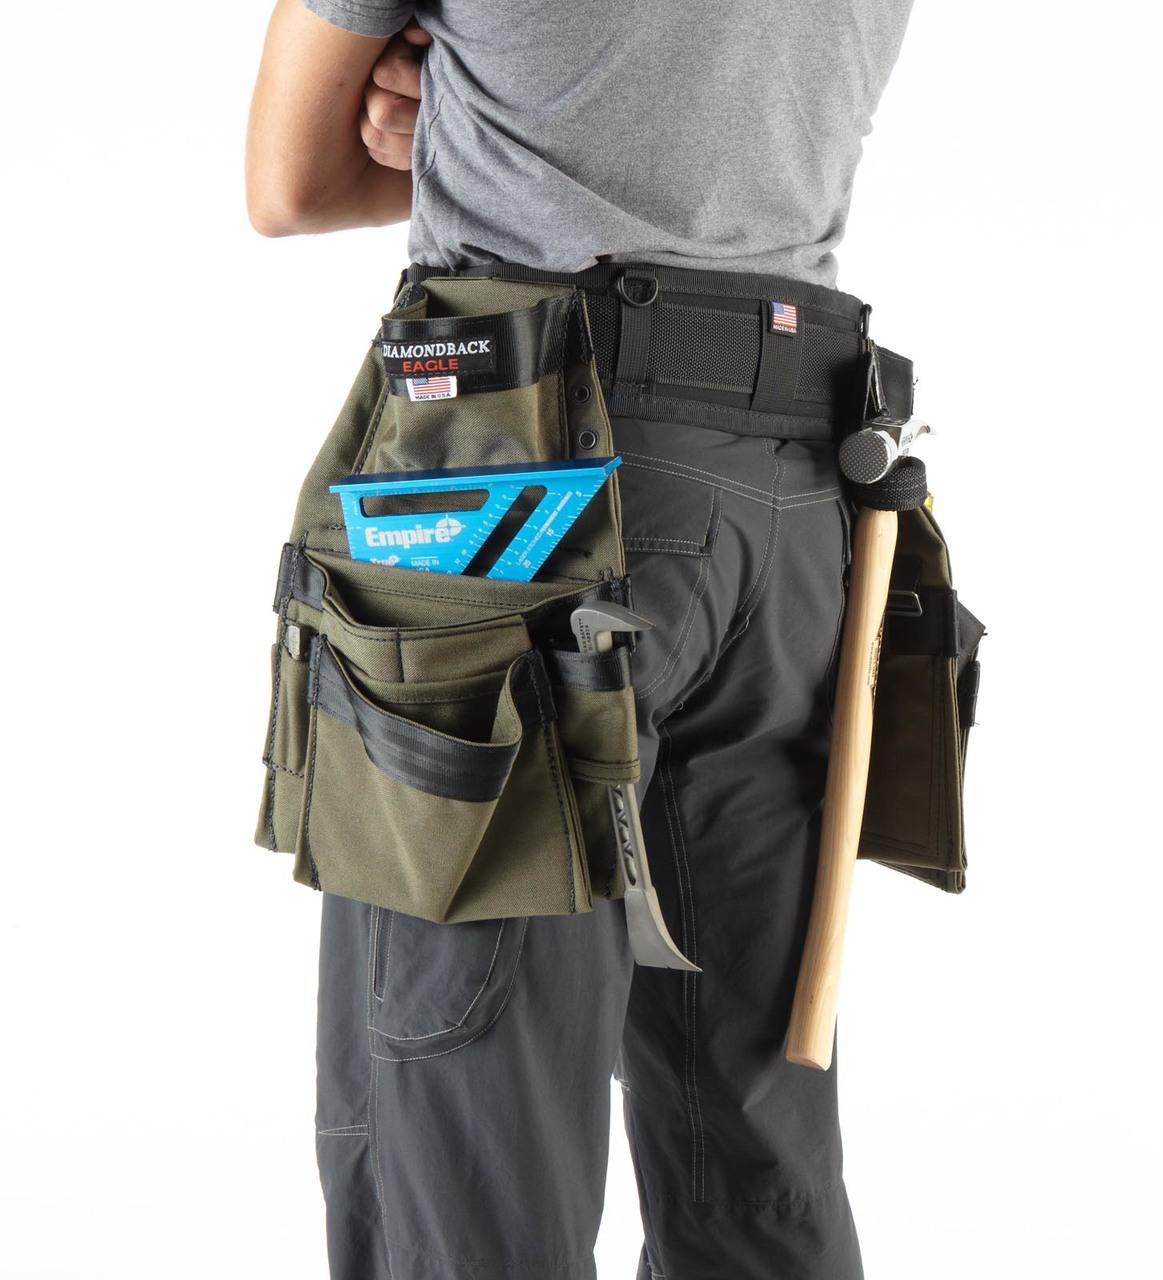 DiamondBack ToolBelt DBT-DB5-3  The Raptor - Carpenter/Remodeler